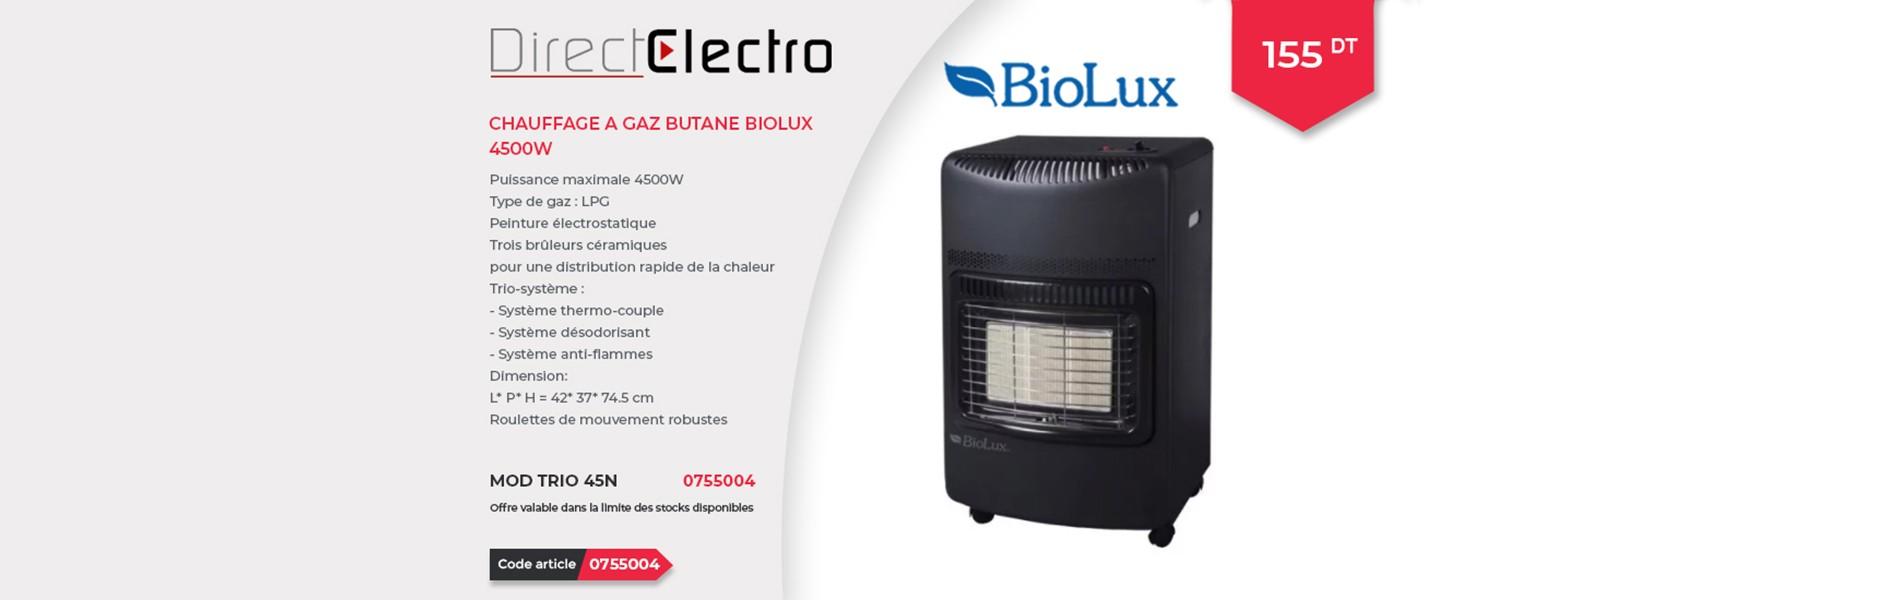 https://directelectro.tn/117-chauffage-gaz-butane